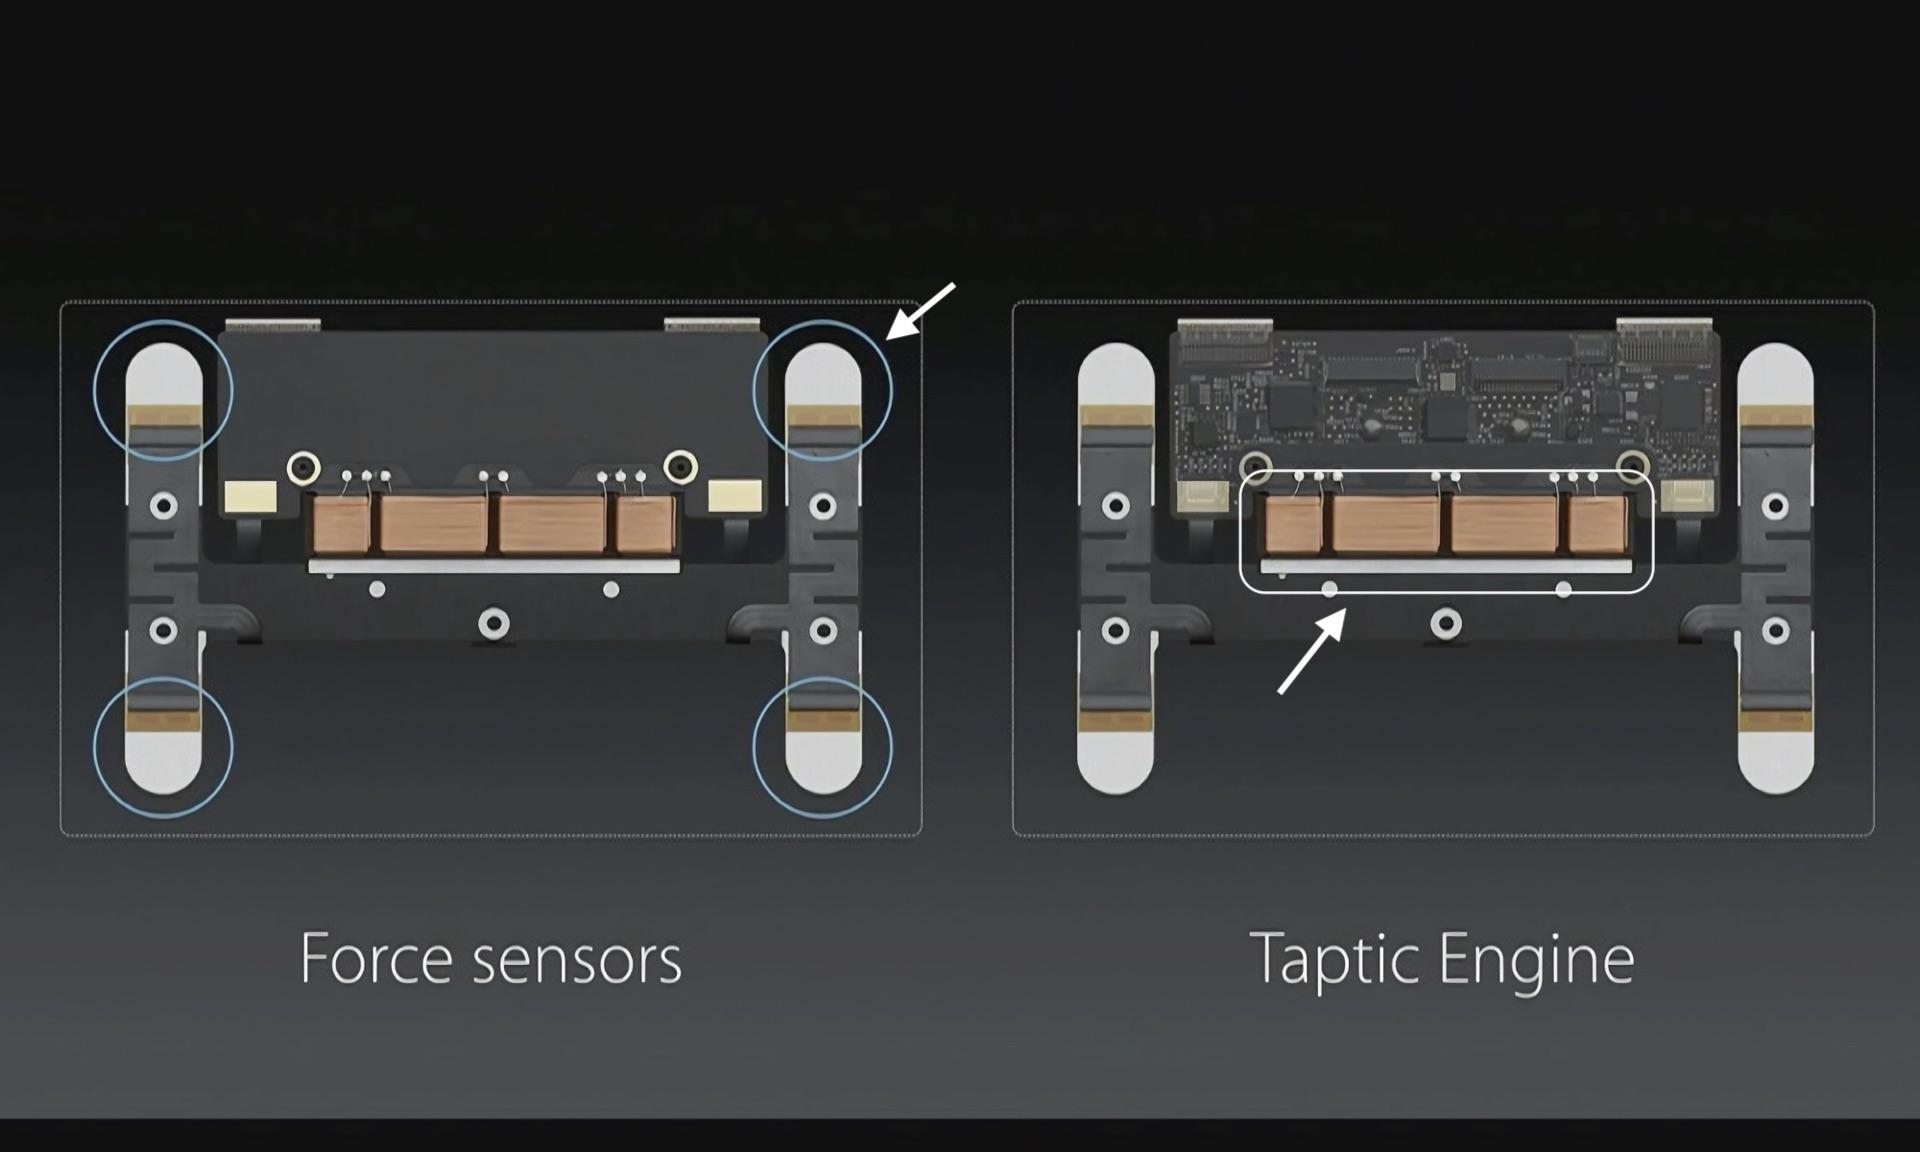 12inch Retina MacBookのトラックパッド